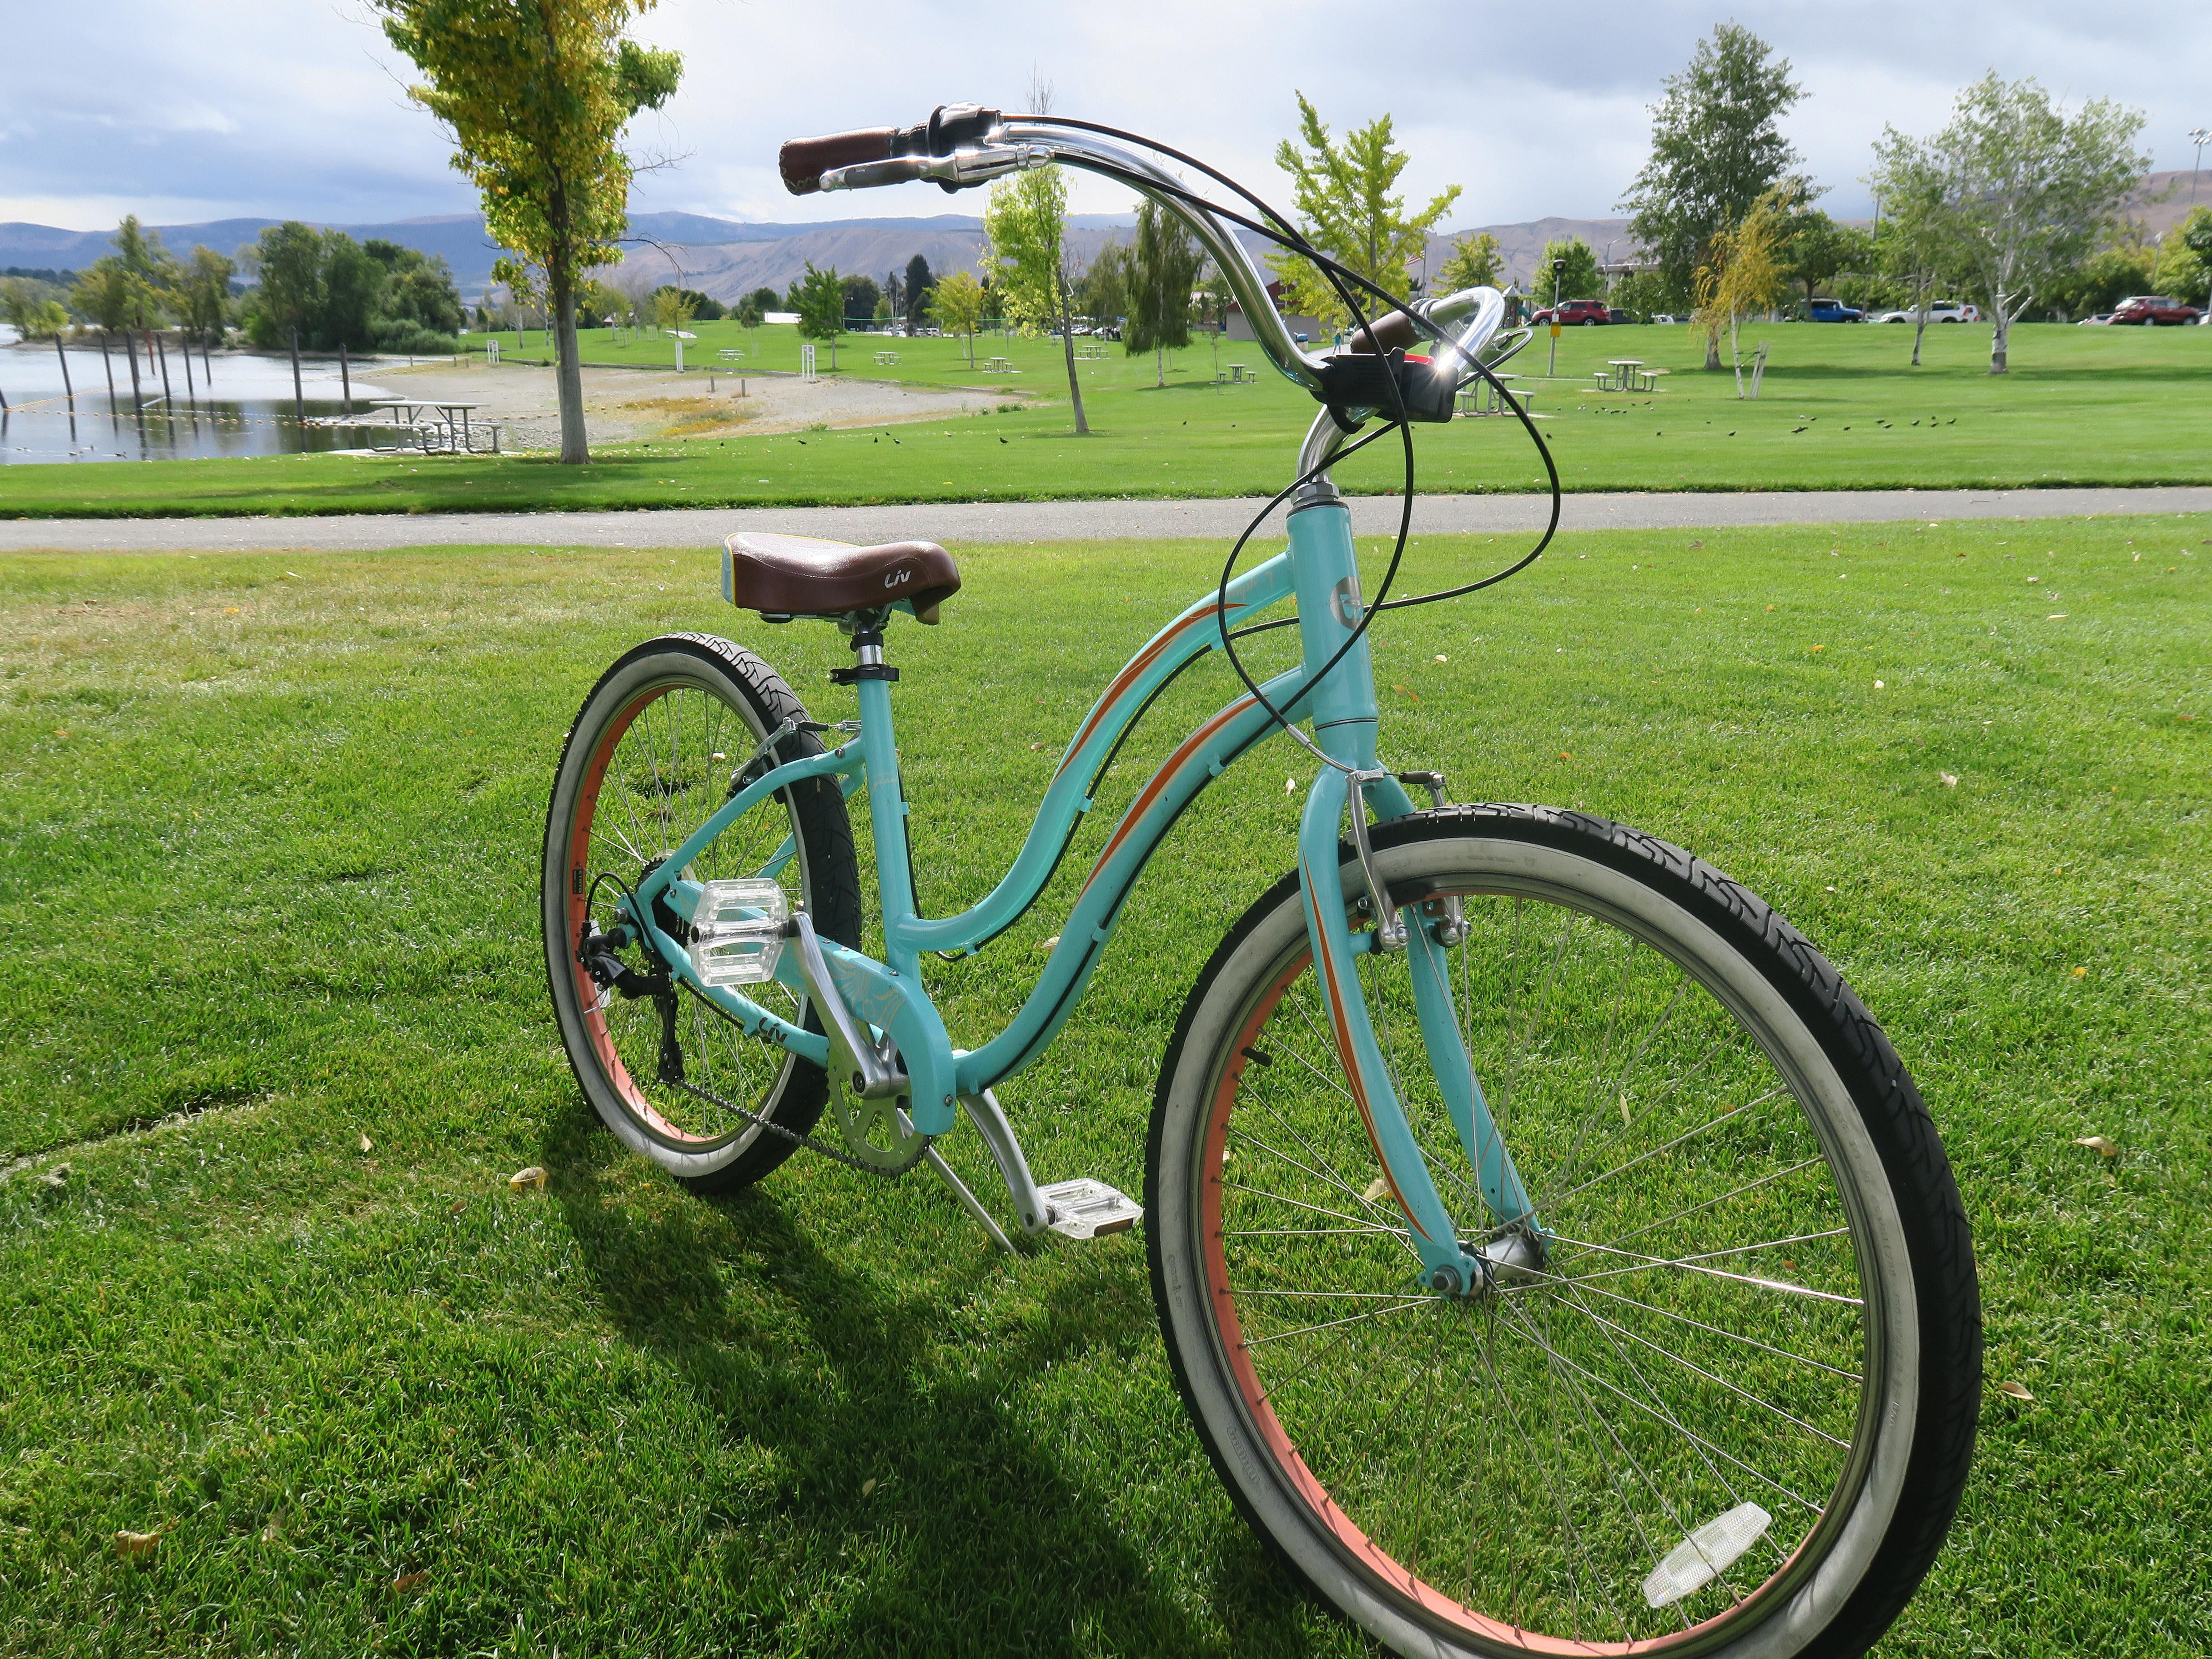 Arlberg Sports: Renting Bikes